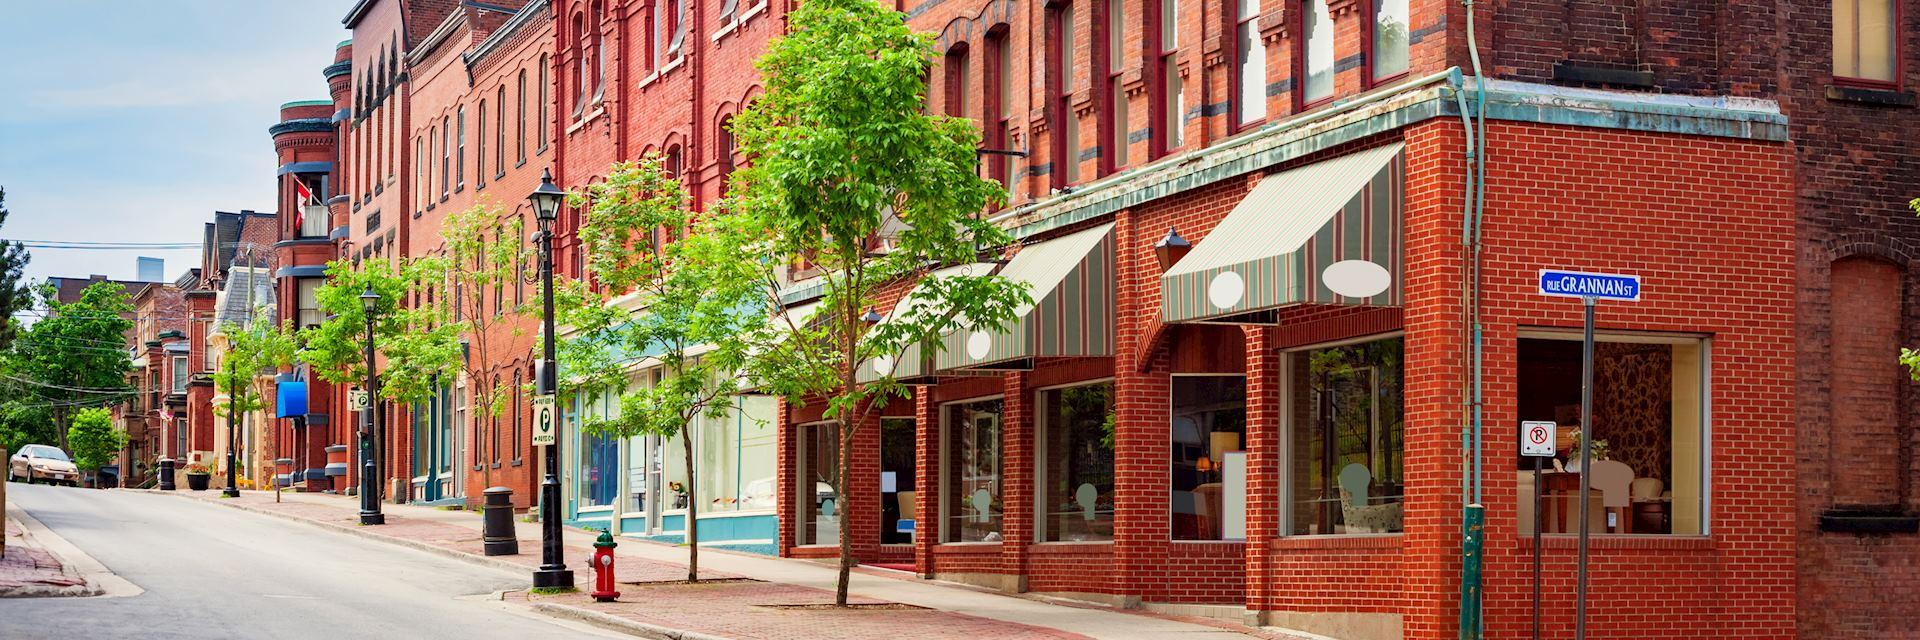 Downtown Saint John, New Brunswick